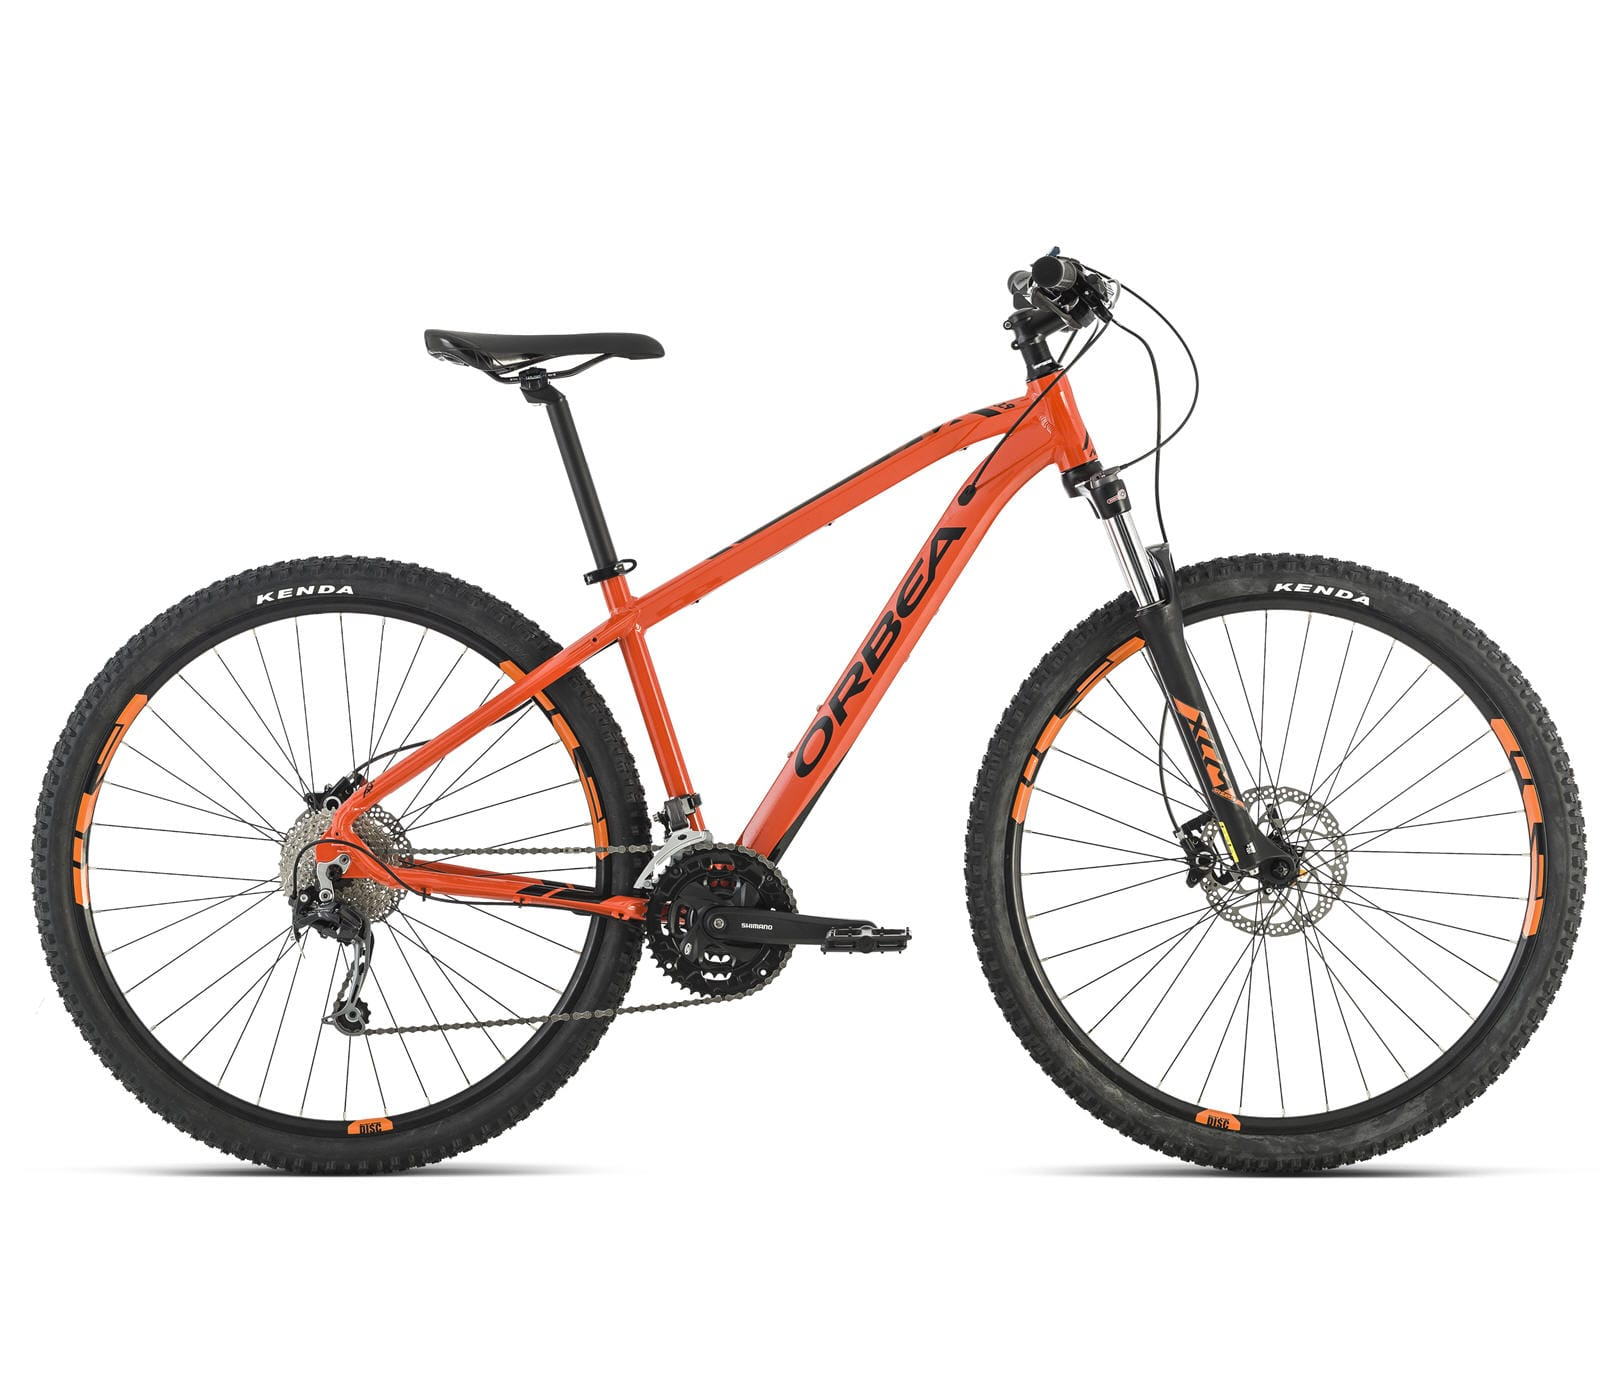 Orbea Mx 25 27 5 Quot Hardtail Mtb Bike 2016 All Terrain Cycles